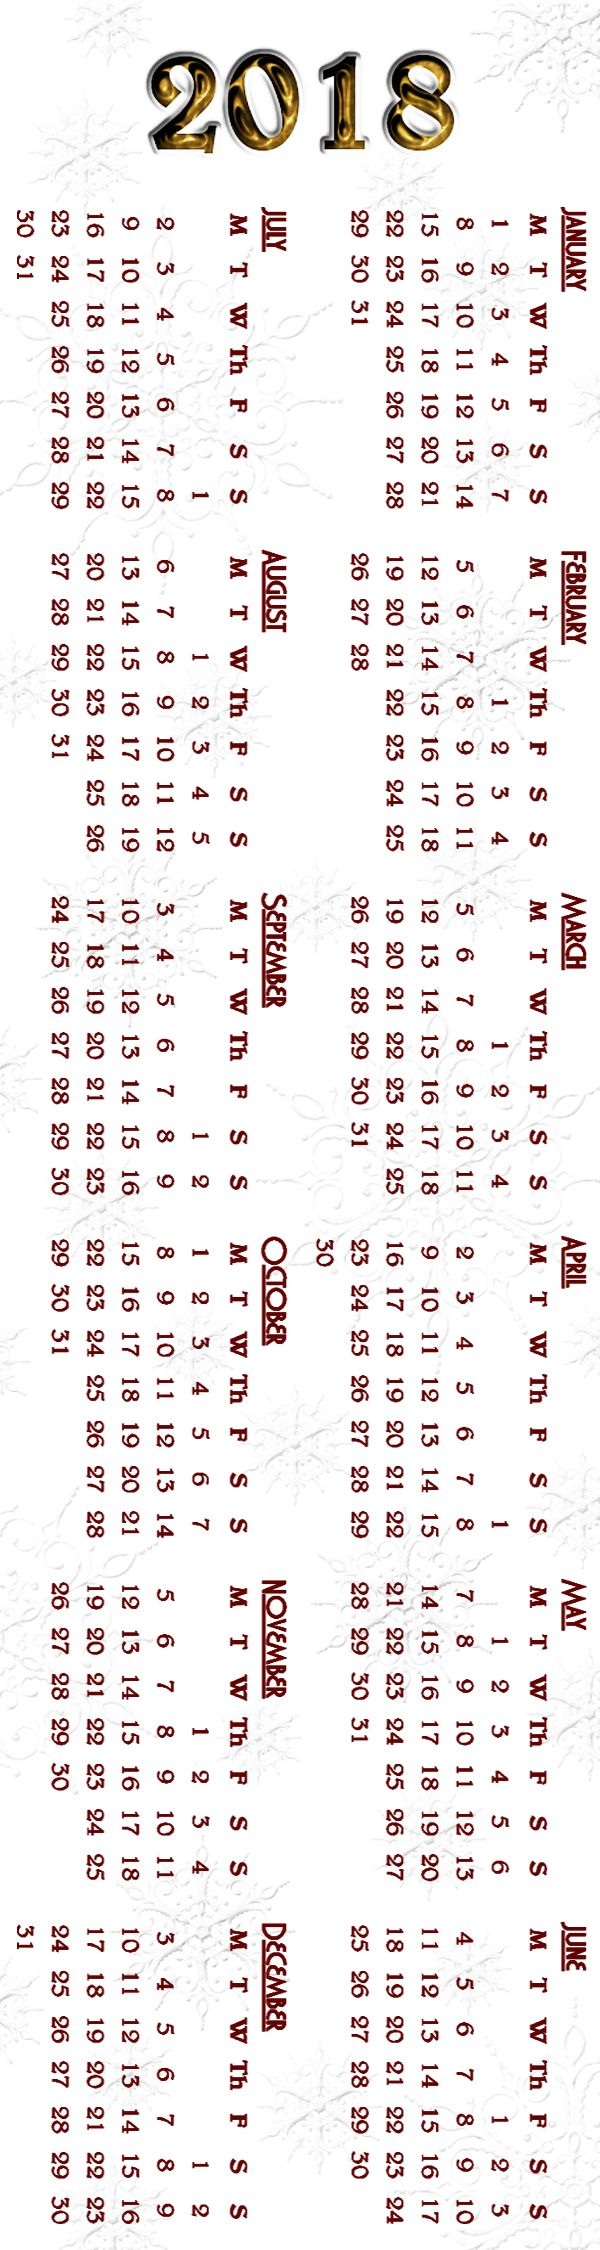 Calendar Bookmark : Bookmark calendar snowflake background